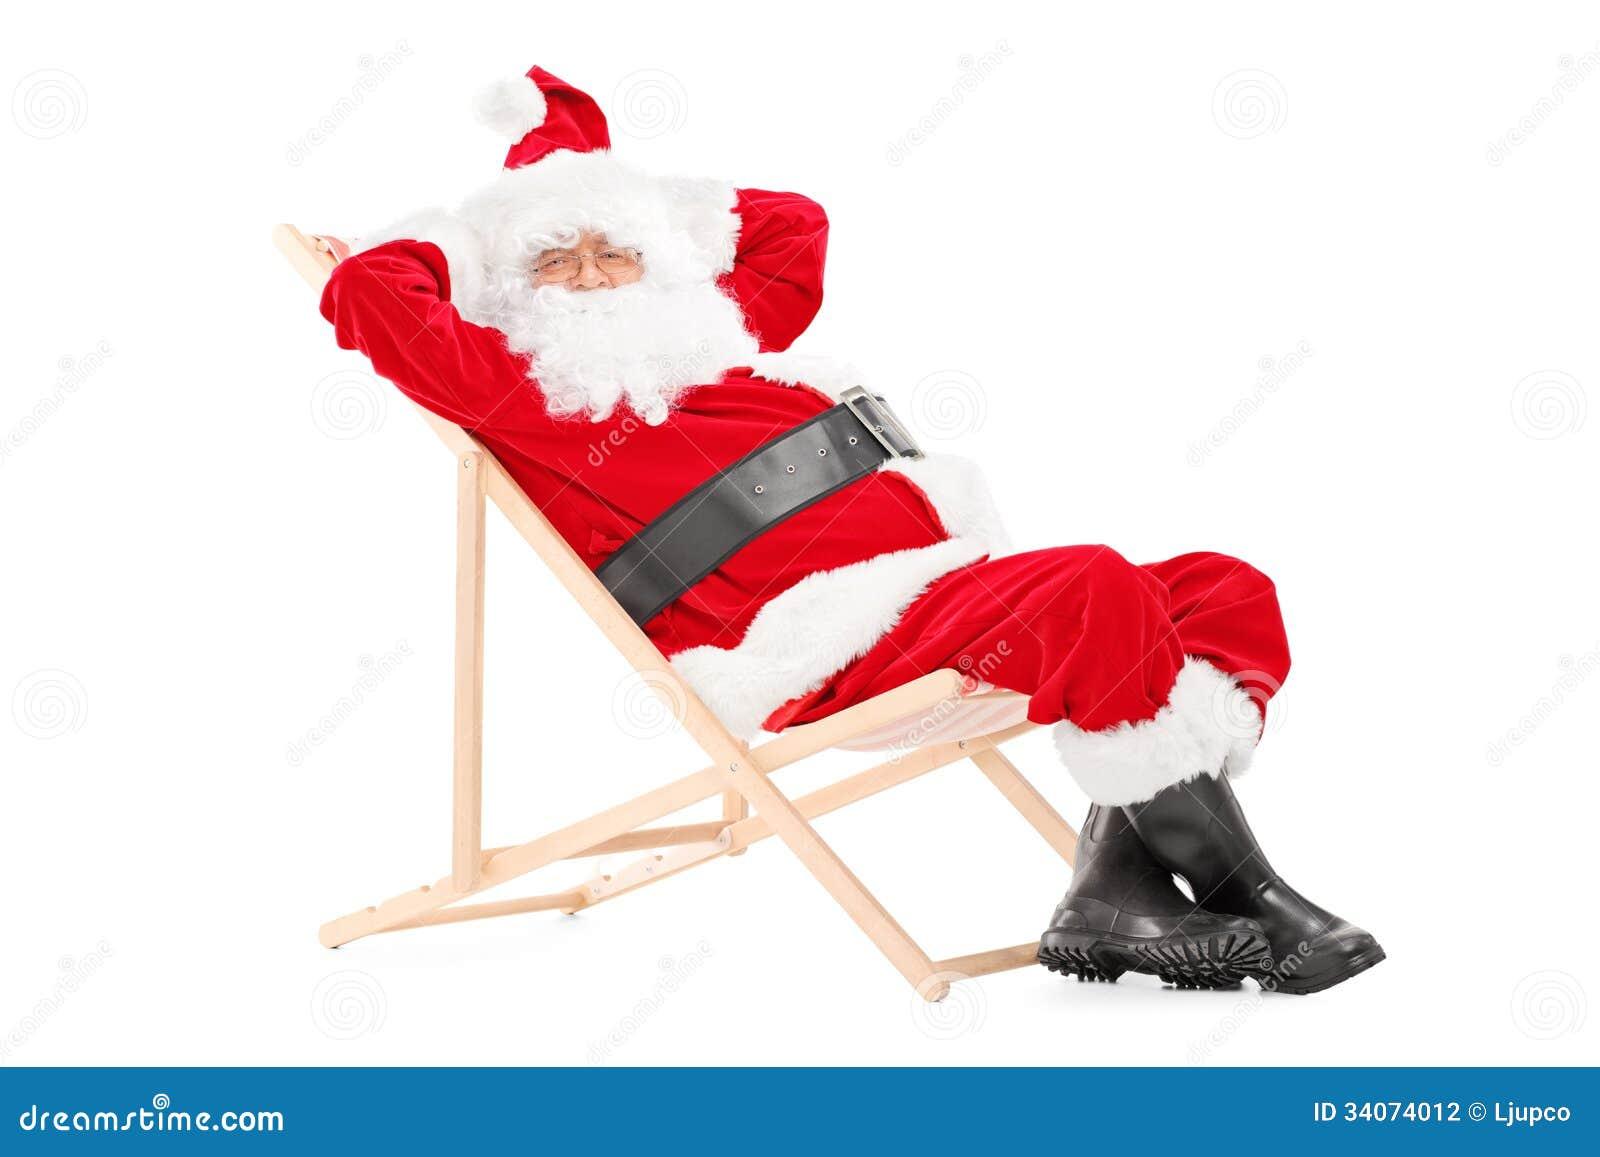 Smiling Santa Claus on a beach chair looking at camera